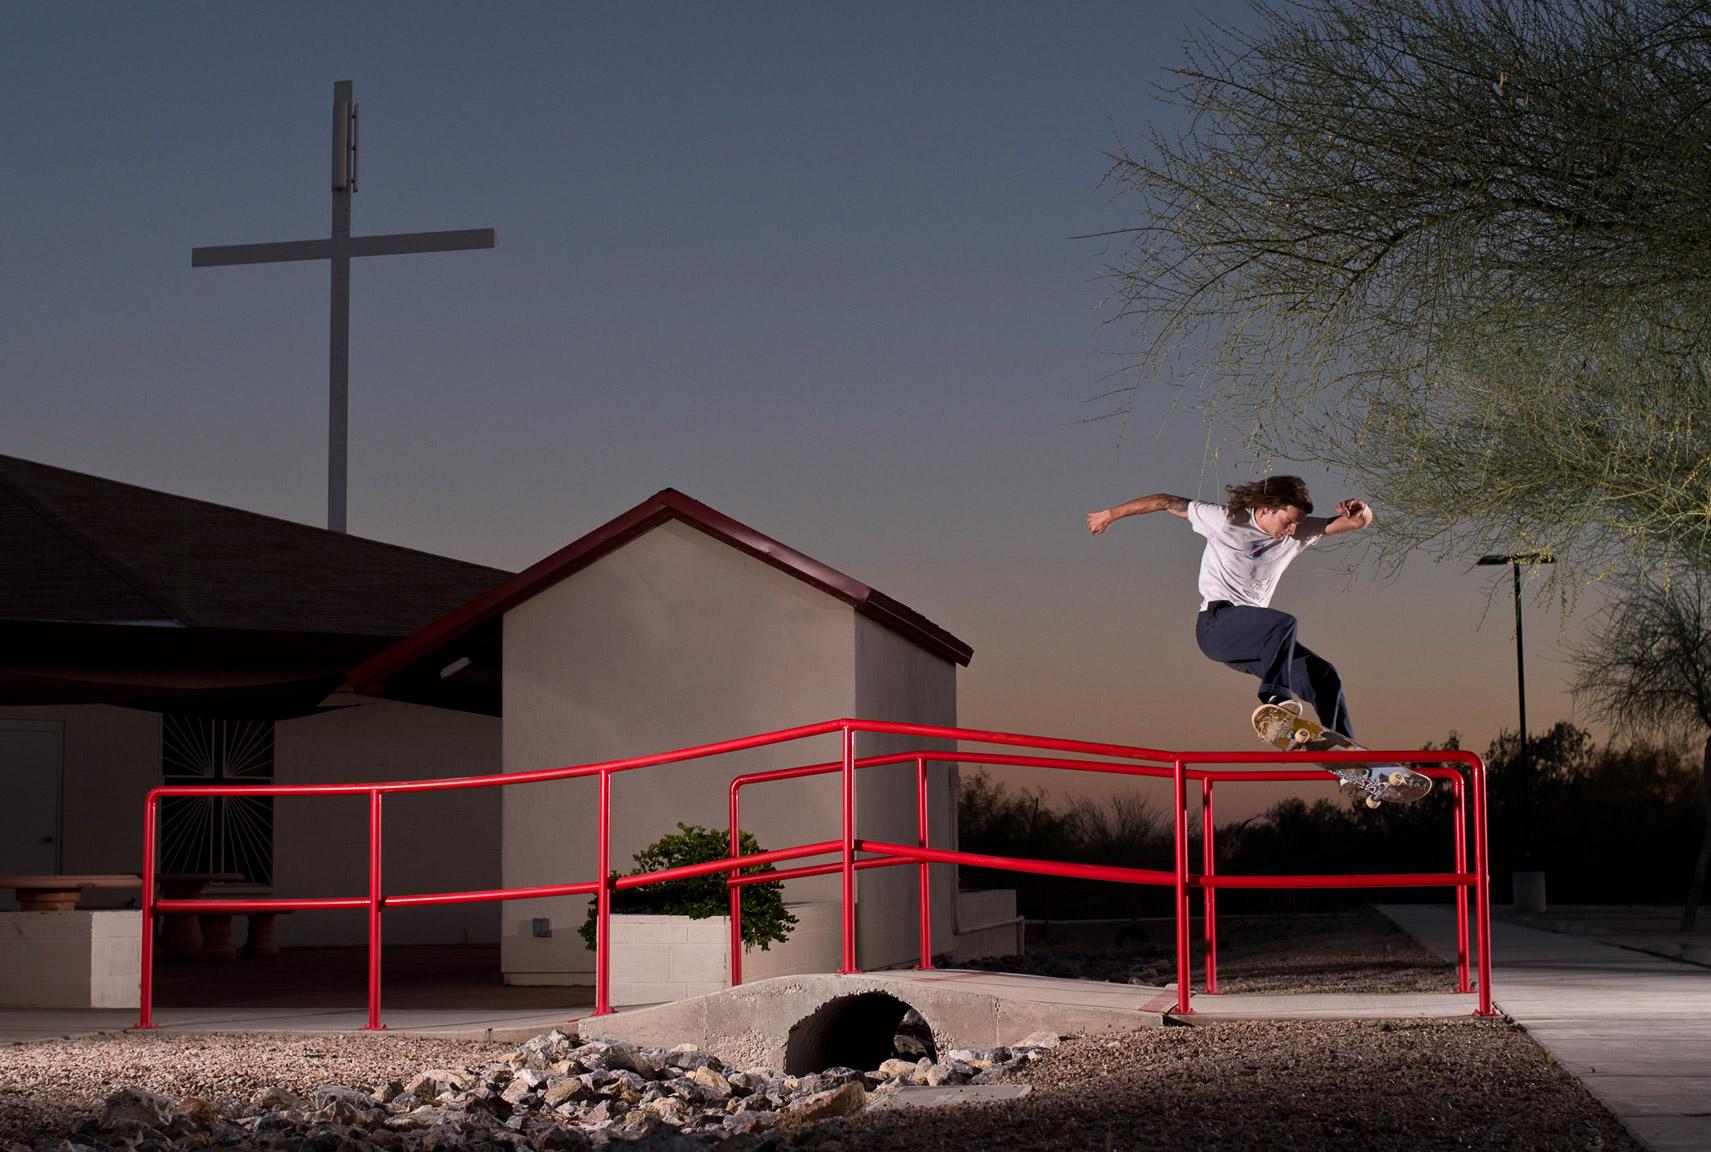 Axel Cruysberghs, Tucson, Arizona